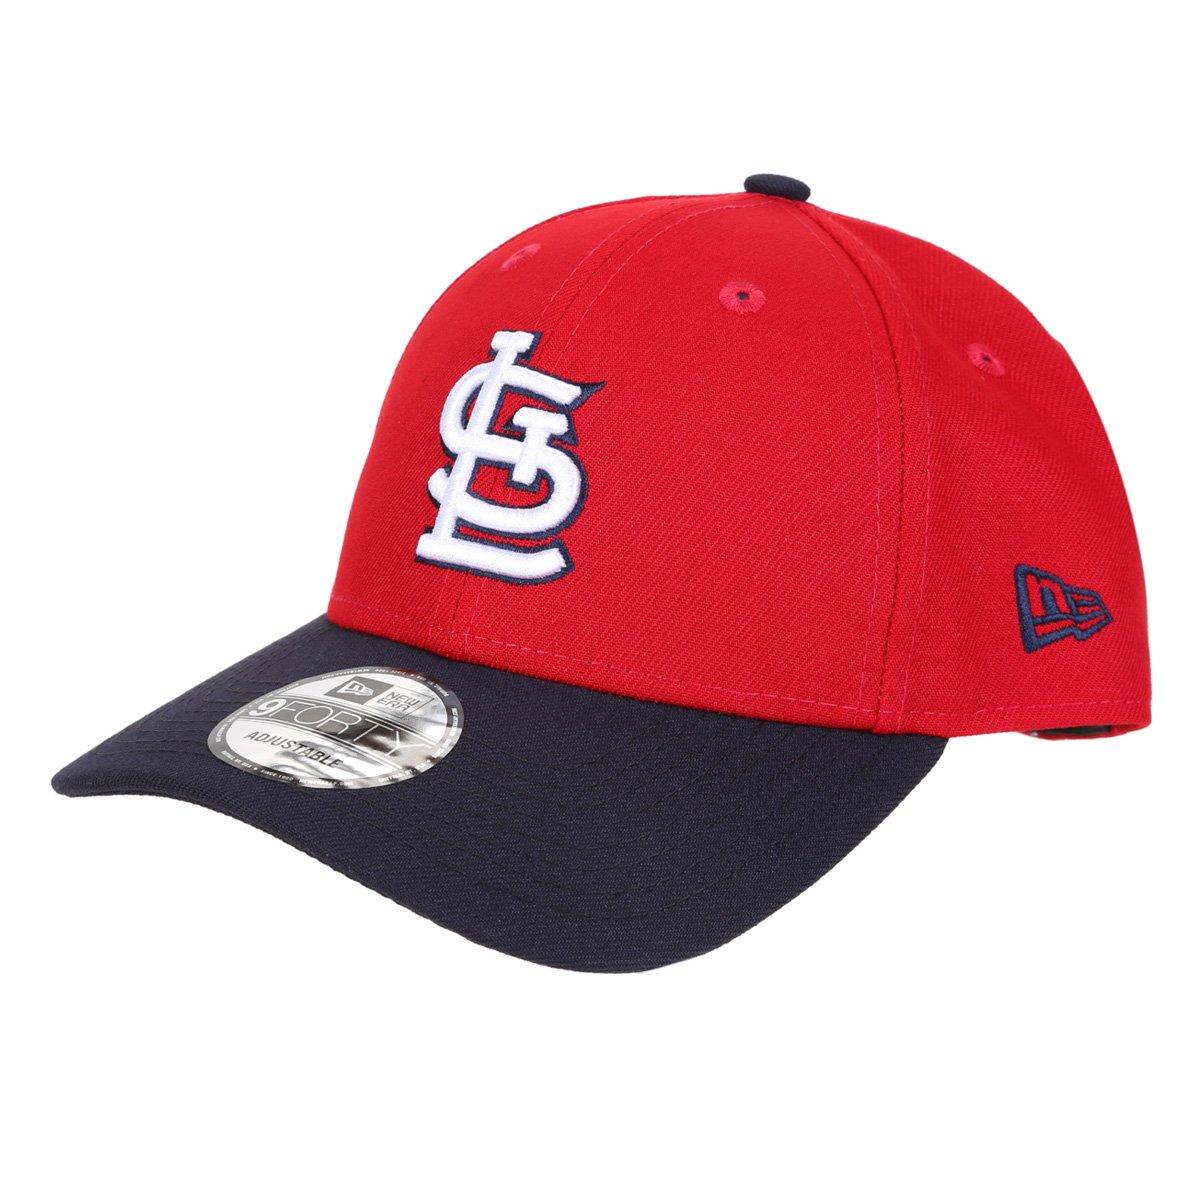 Boné New Era MLB St. Louis Cardinals Aba Curva Snapback 9Fifty